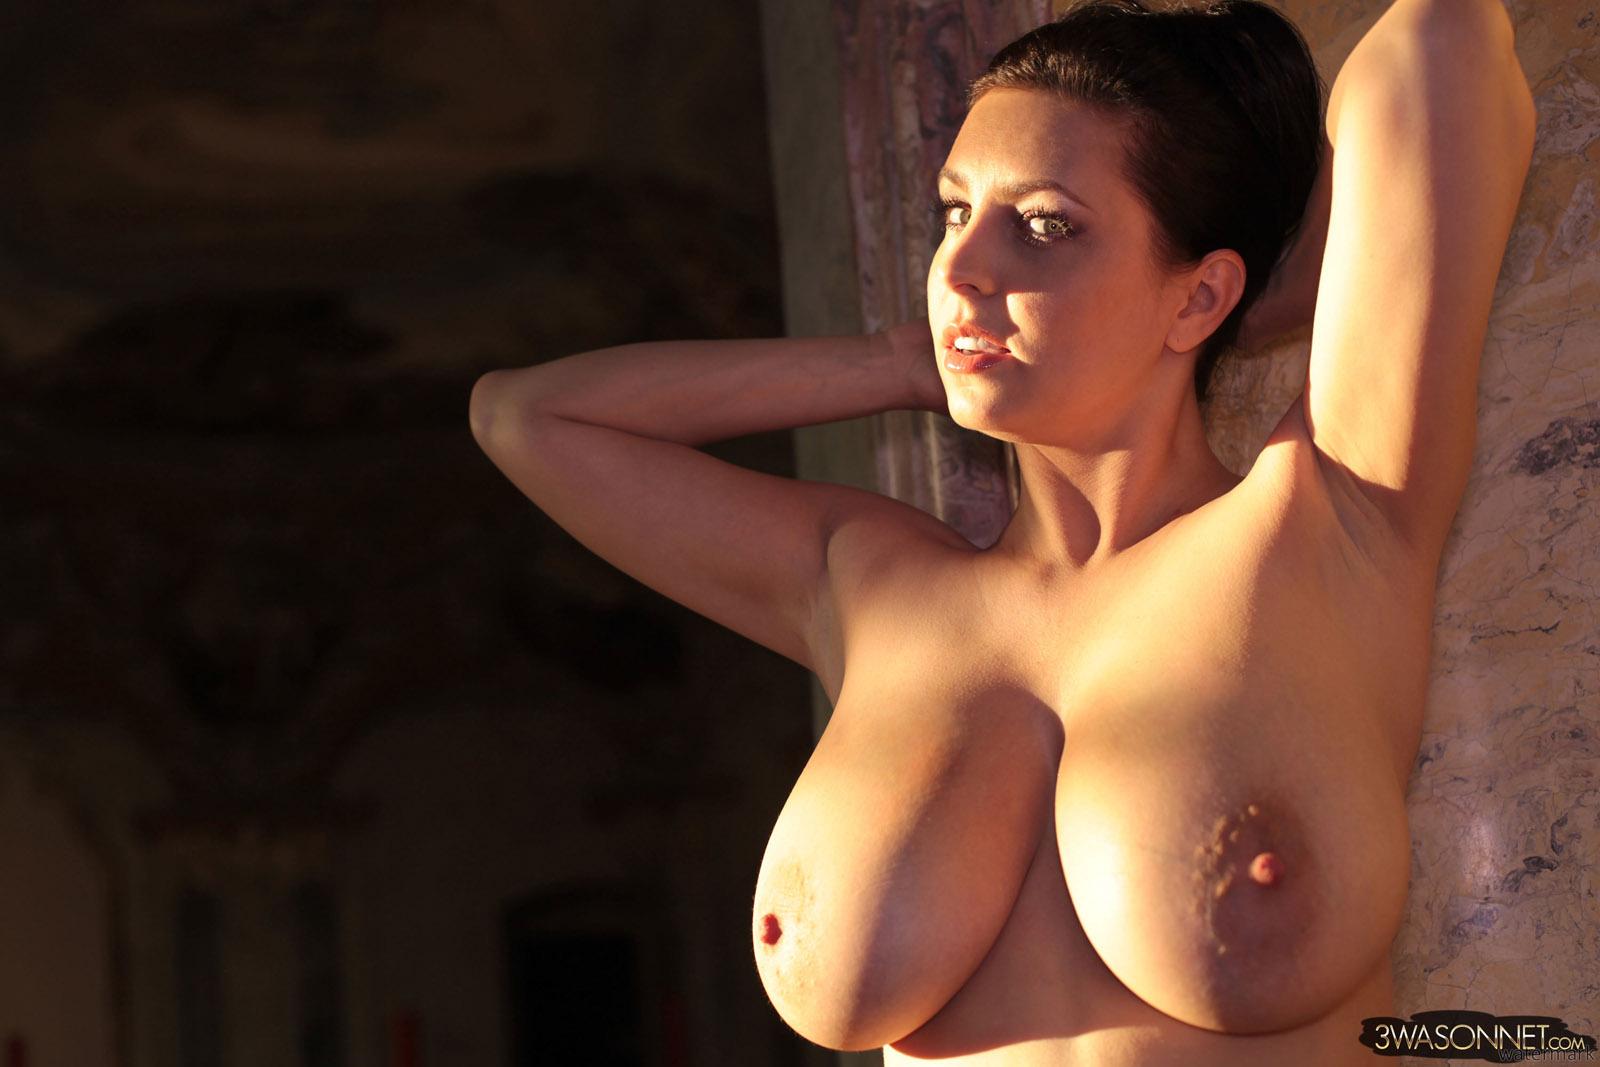 ewa sonnet sucking pussy nude